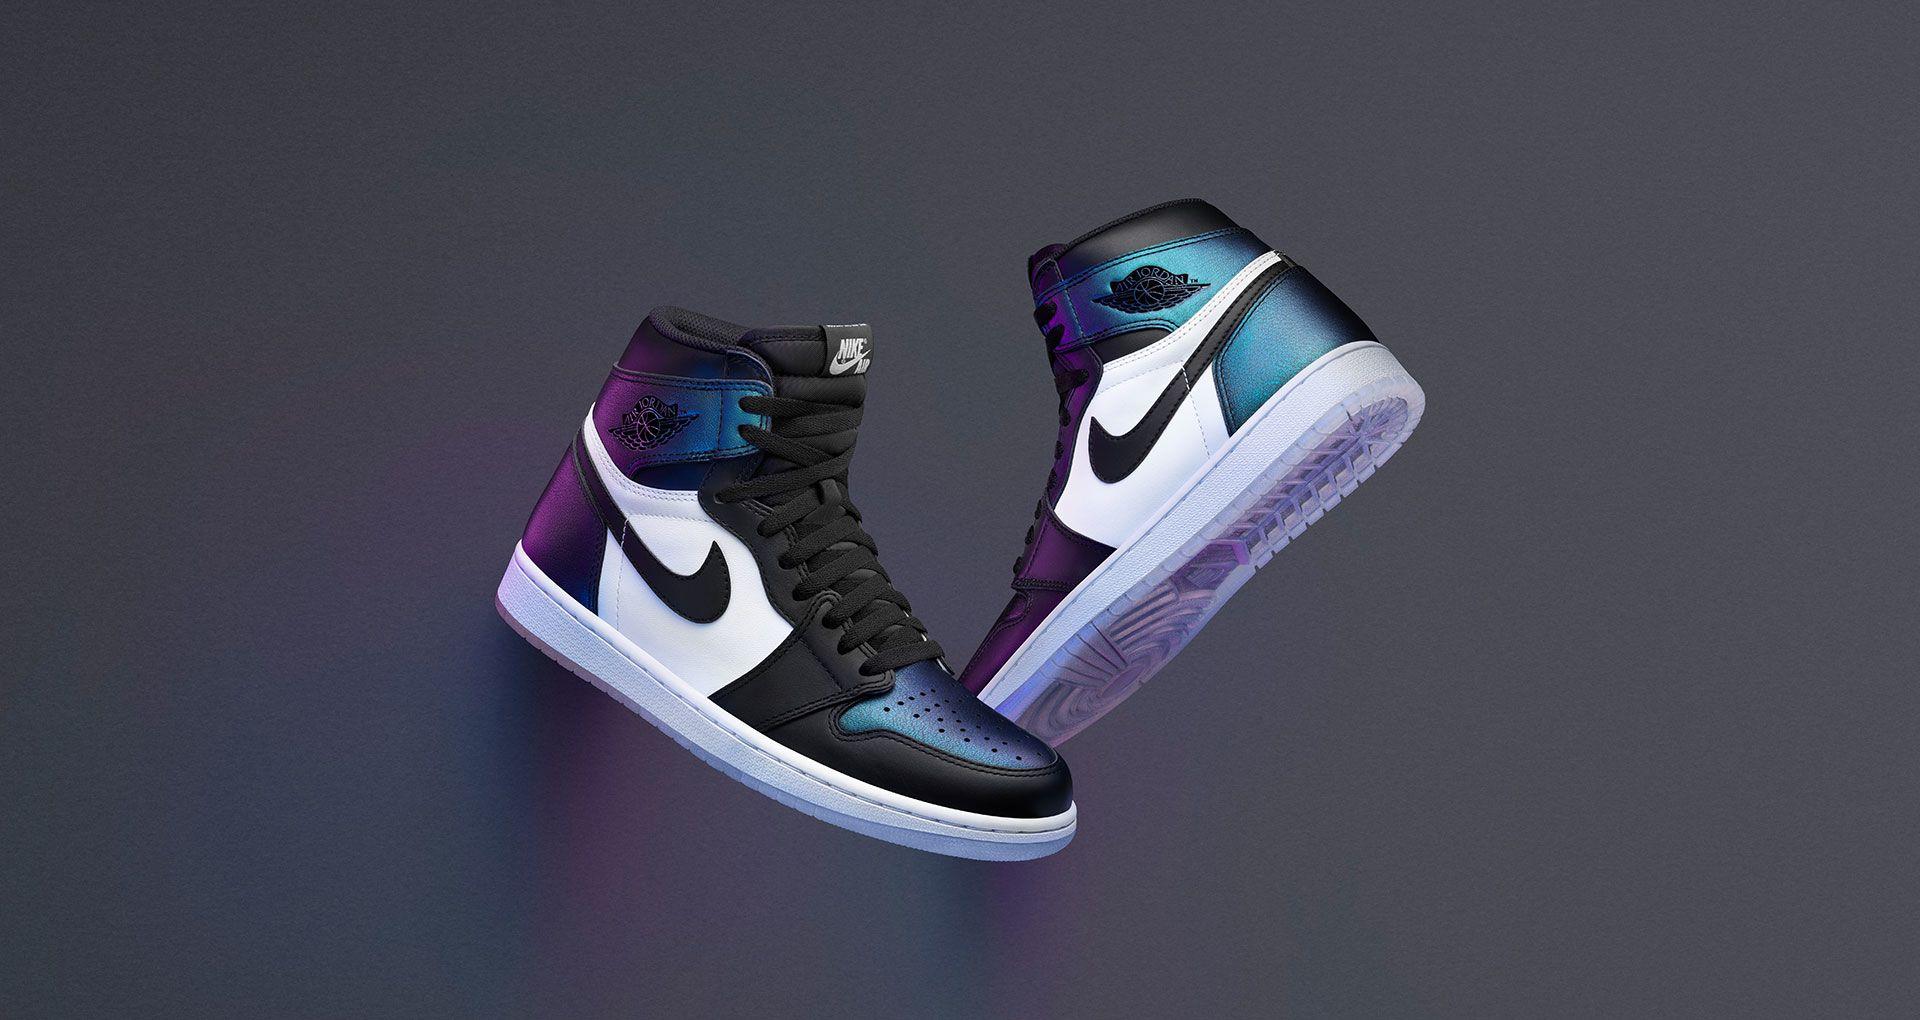 dbf964fcc4ae Air Jordan 1 Retro  Gotta Shine . Nike+ SNKRS